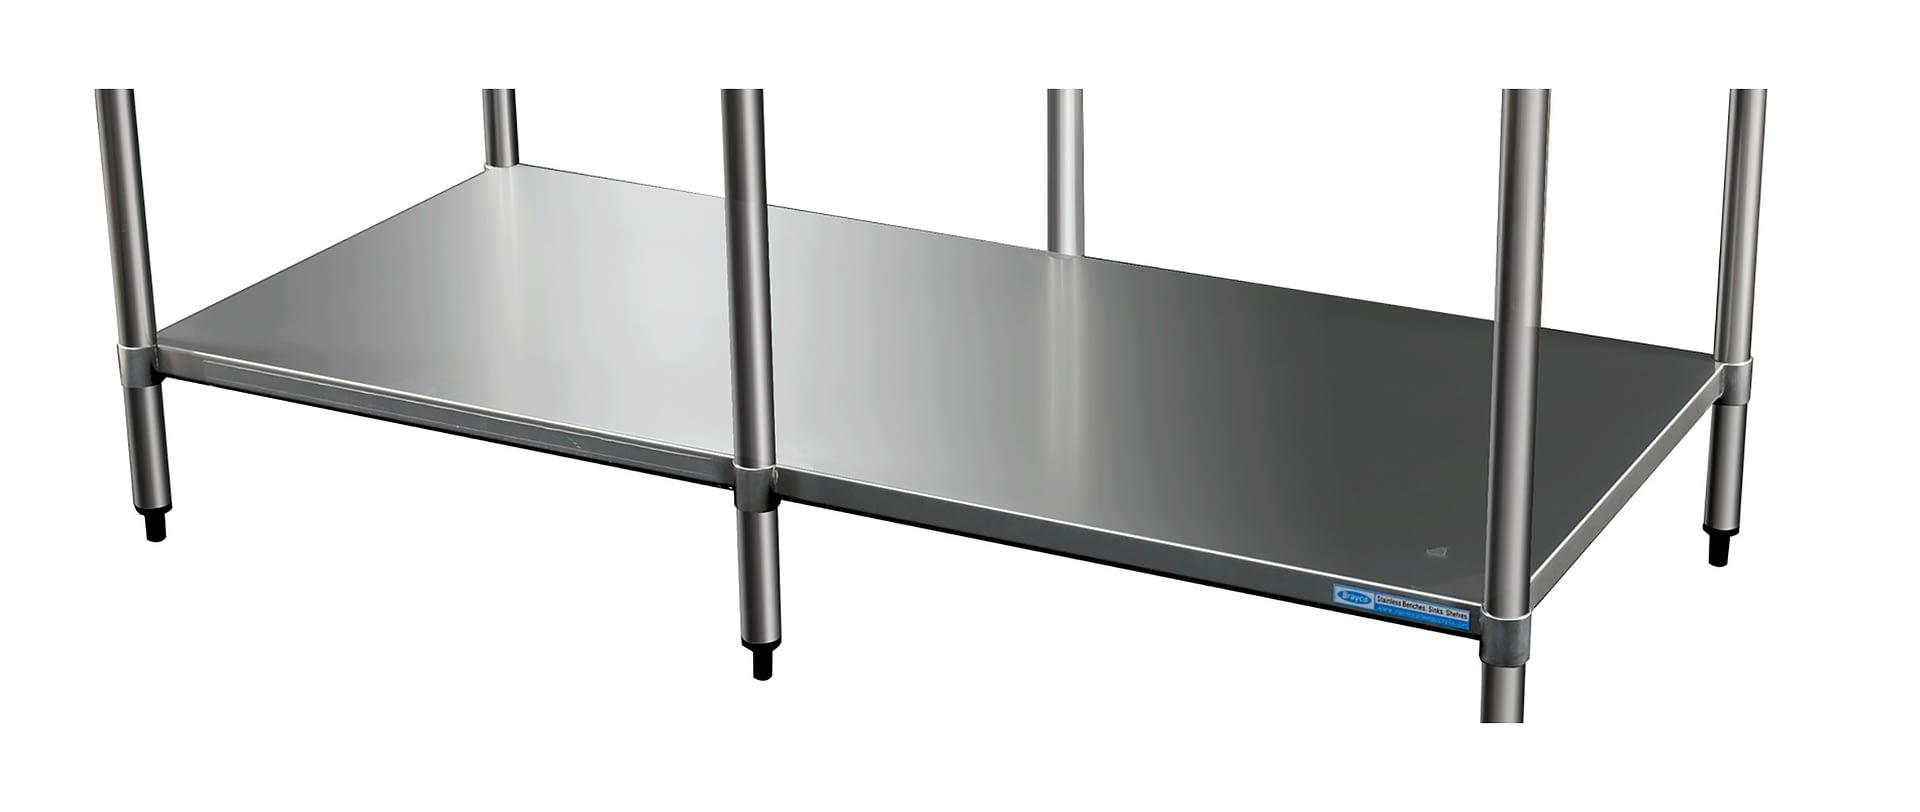 Stainless Undershelf for 3672 Bench